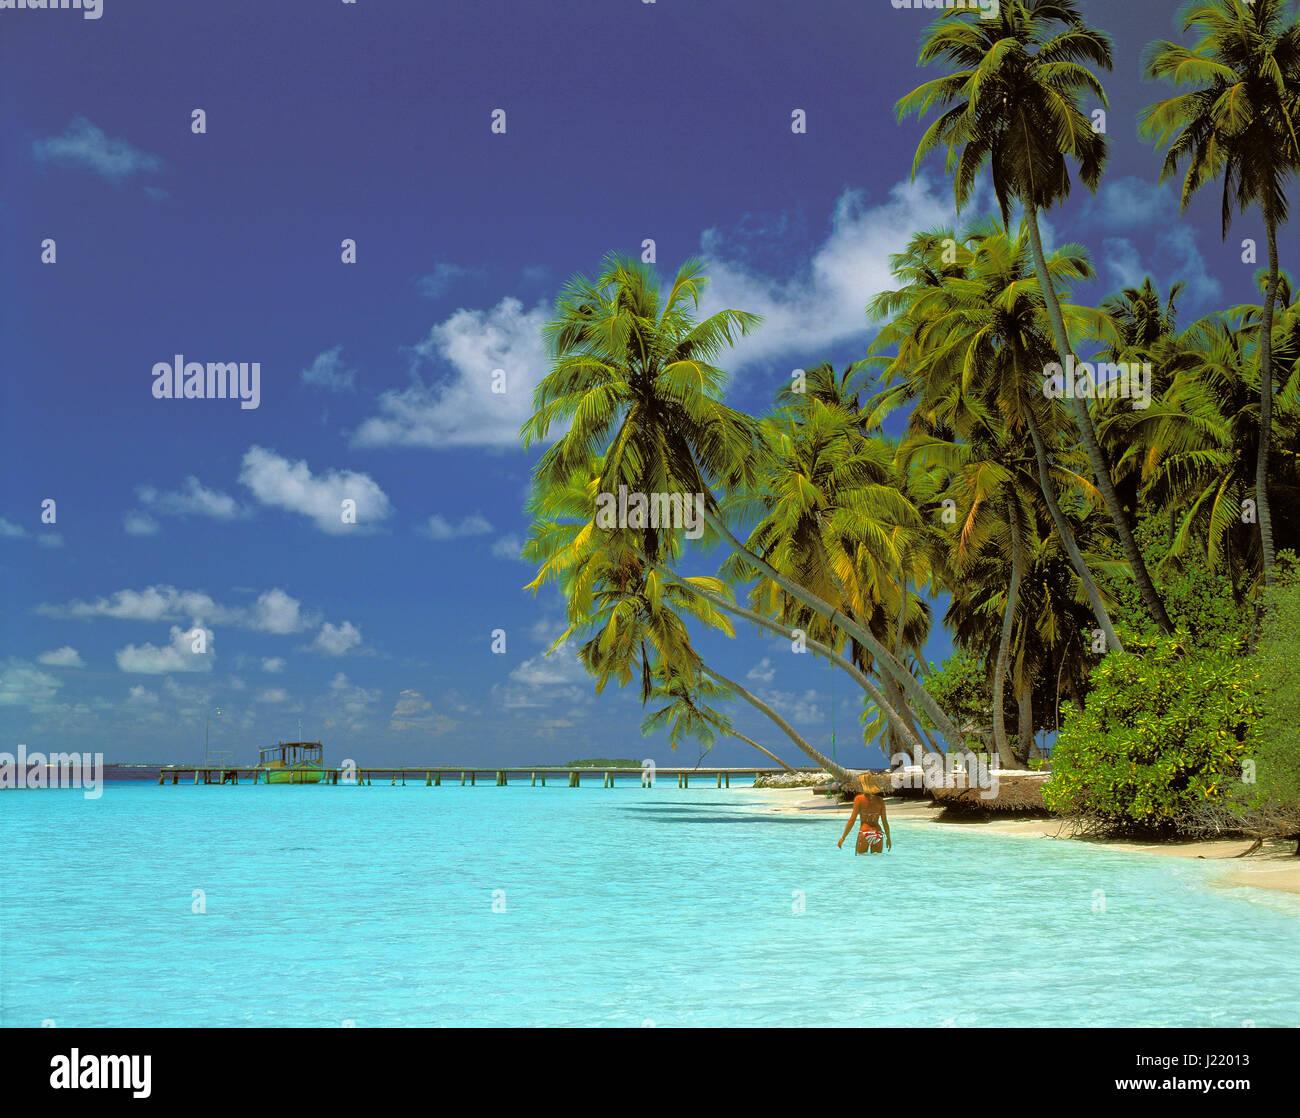 Kuda Bandos Island, Maldives Republic. - Stock Image